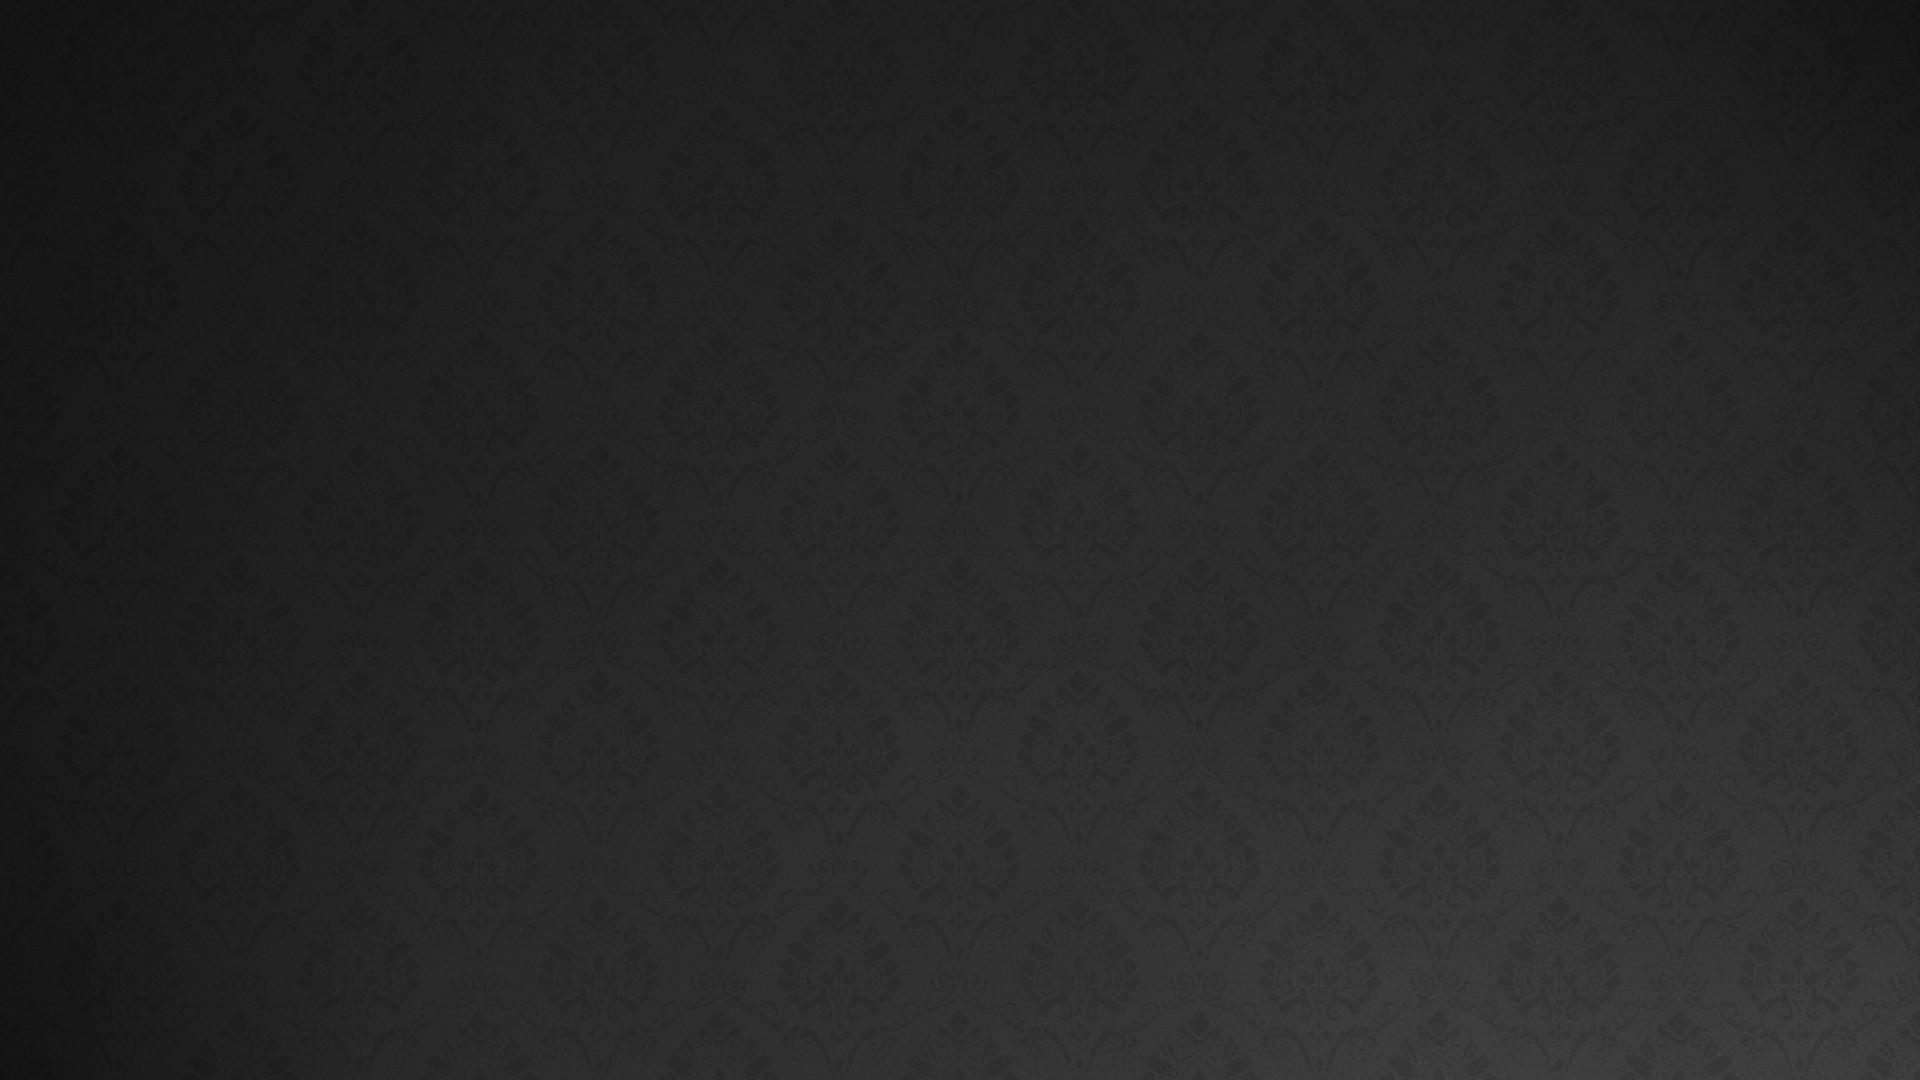 … grey wallpapers hd download free 1 download free 4k amazing …